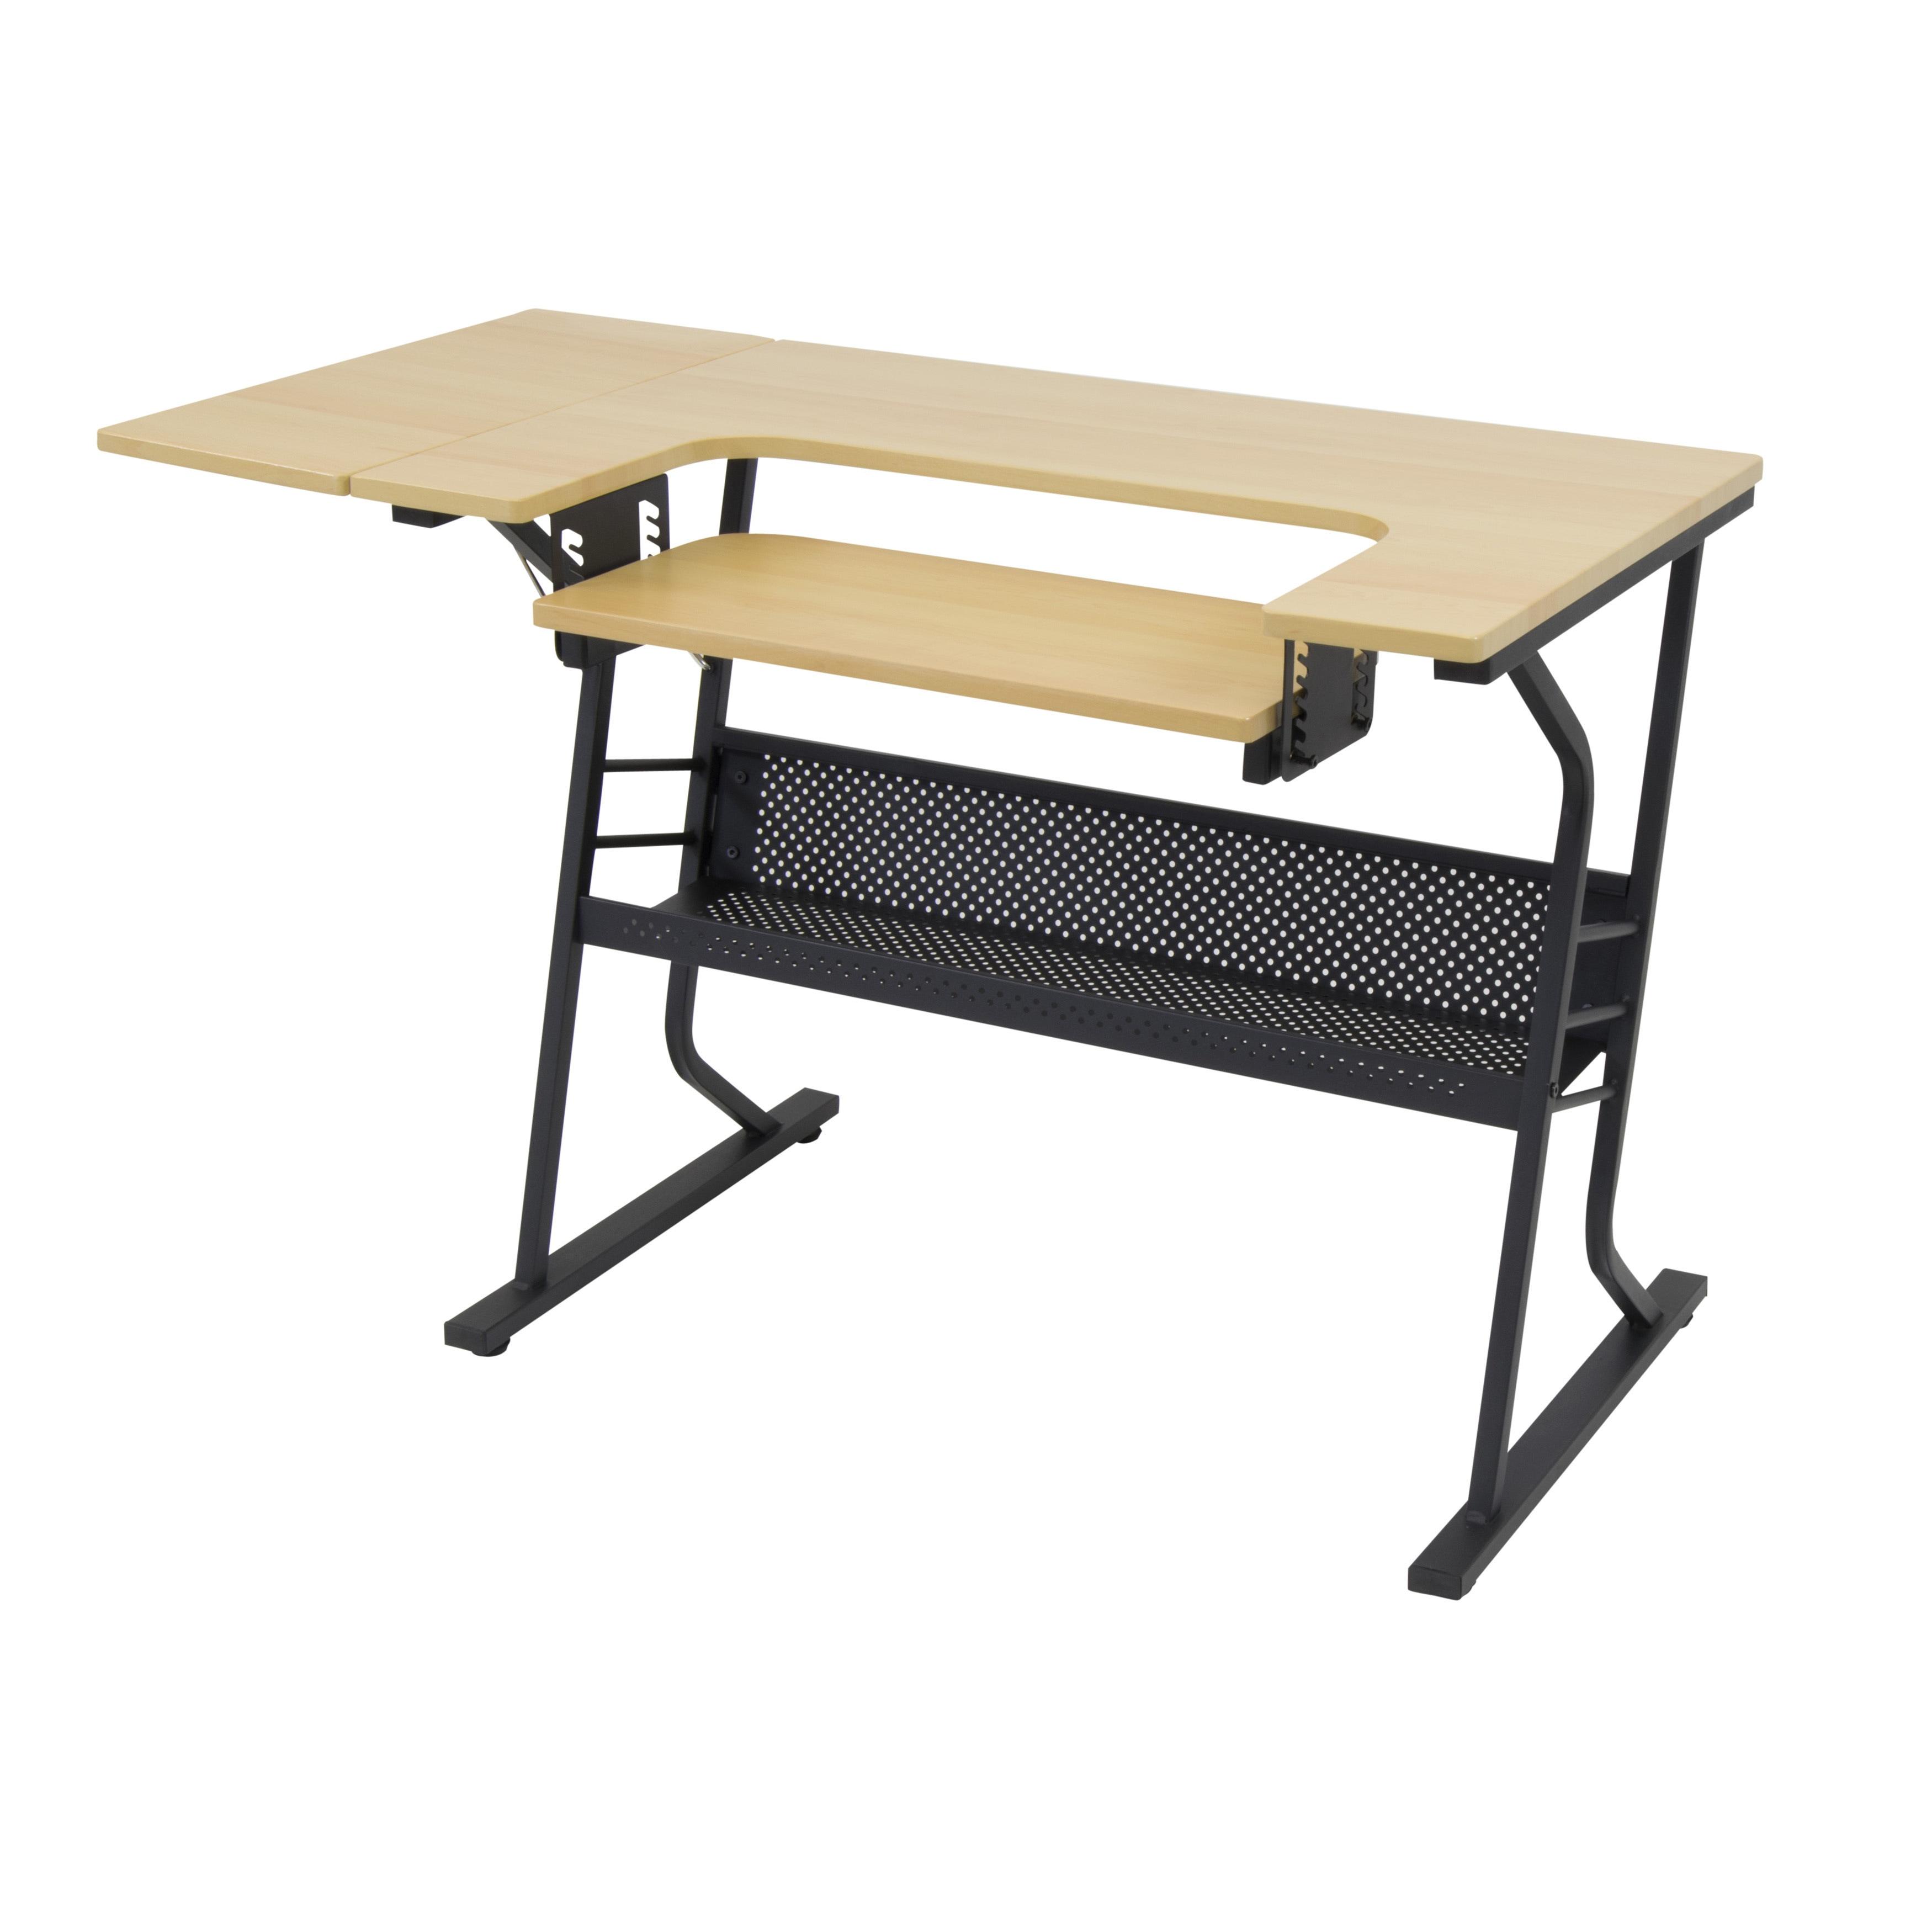 Studio designs eclipse sewing machine table black ebay for Table 6 handbook 44